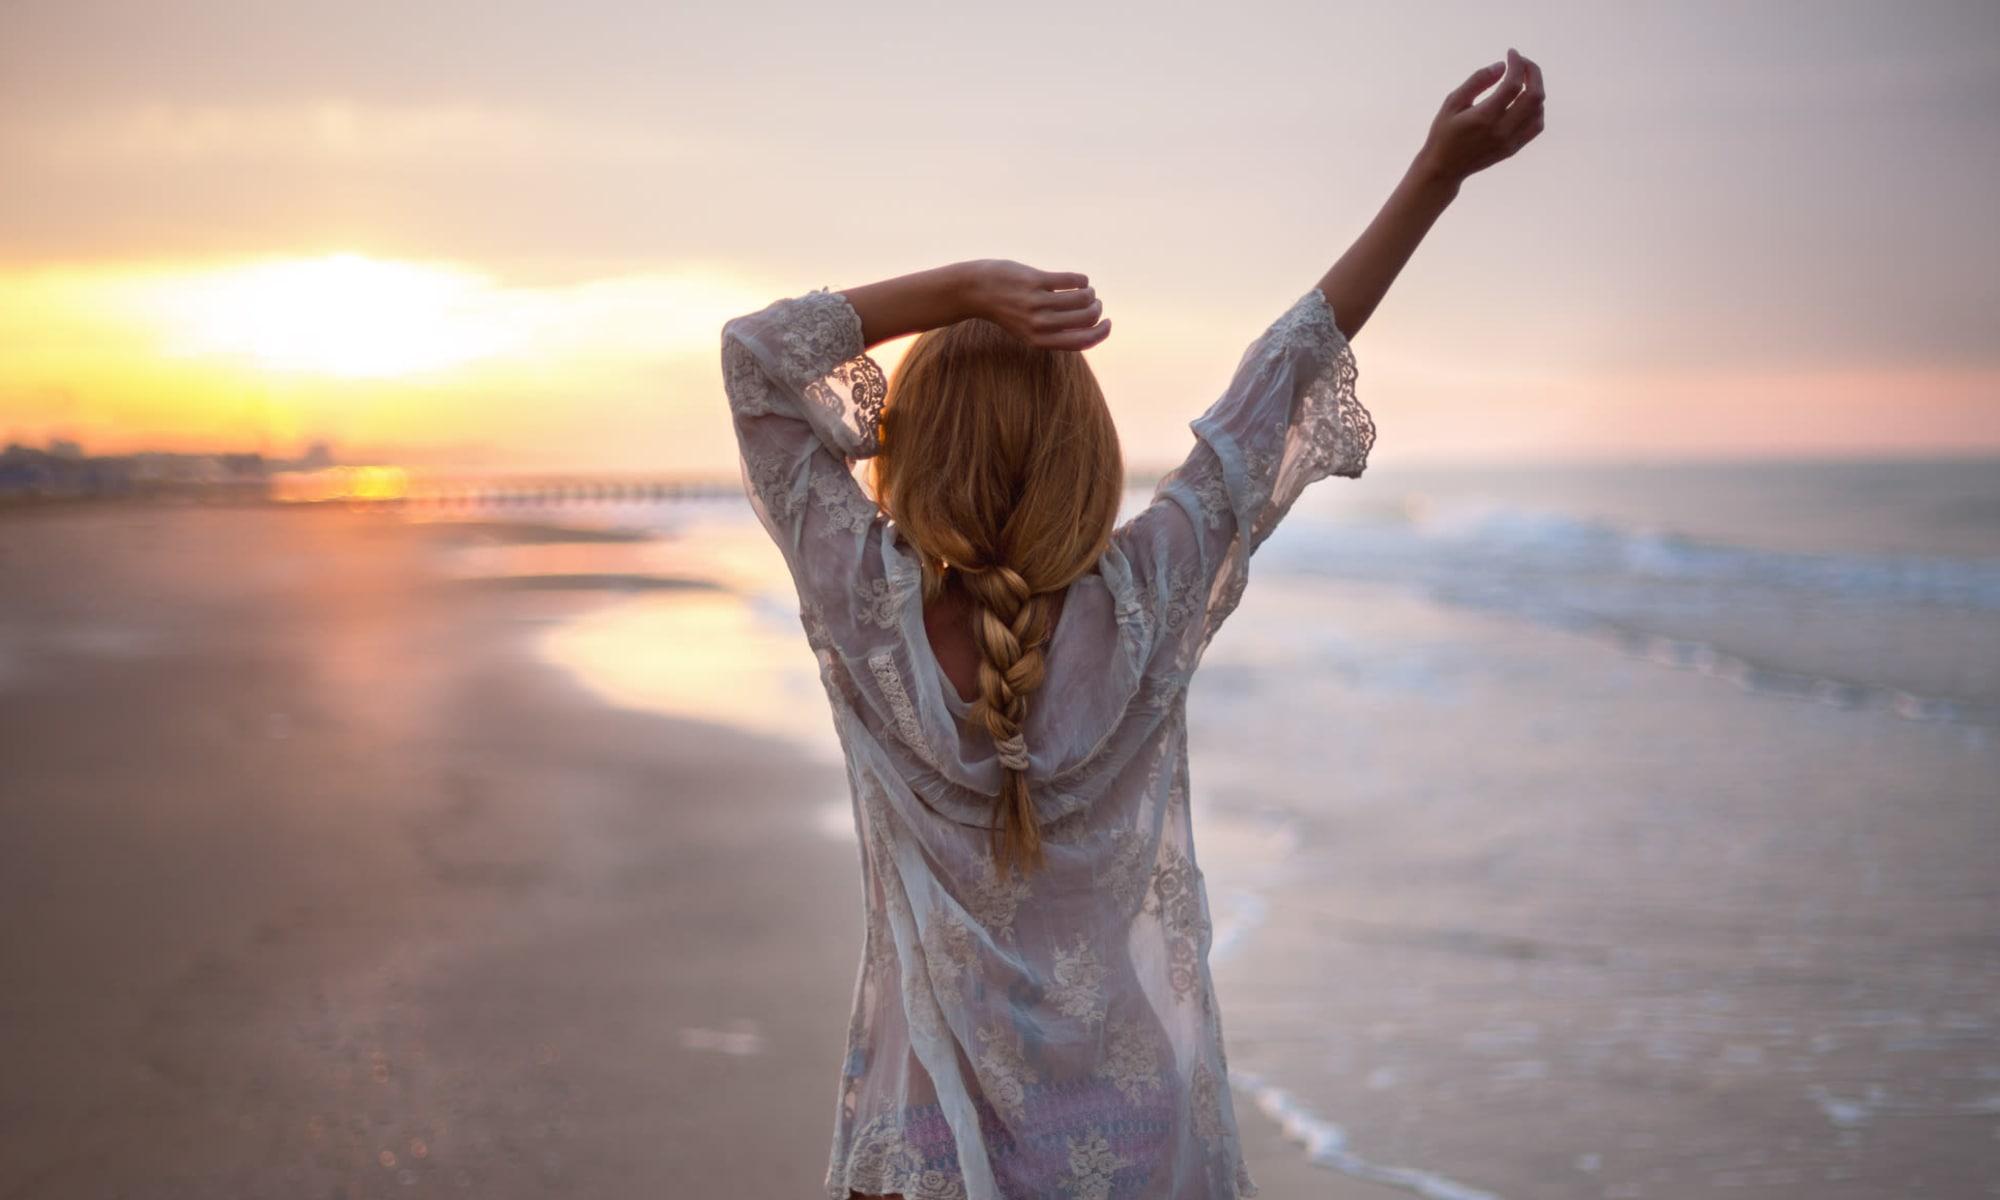 Woman enjoying herself at the beach near Delray Station